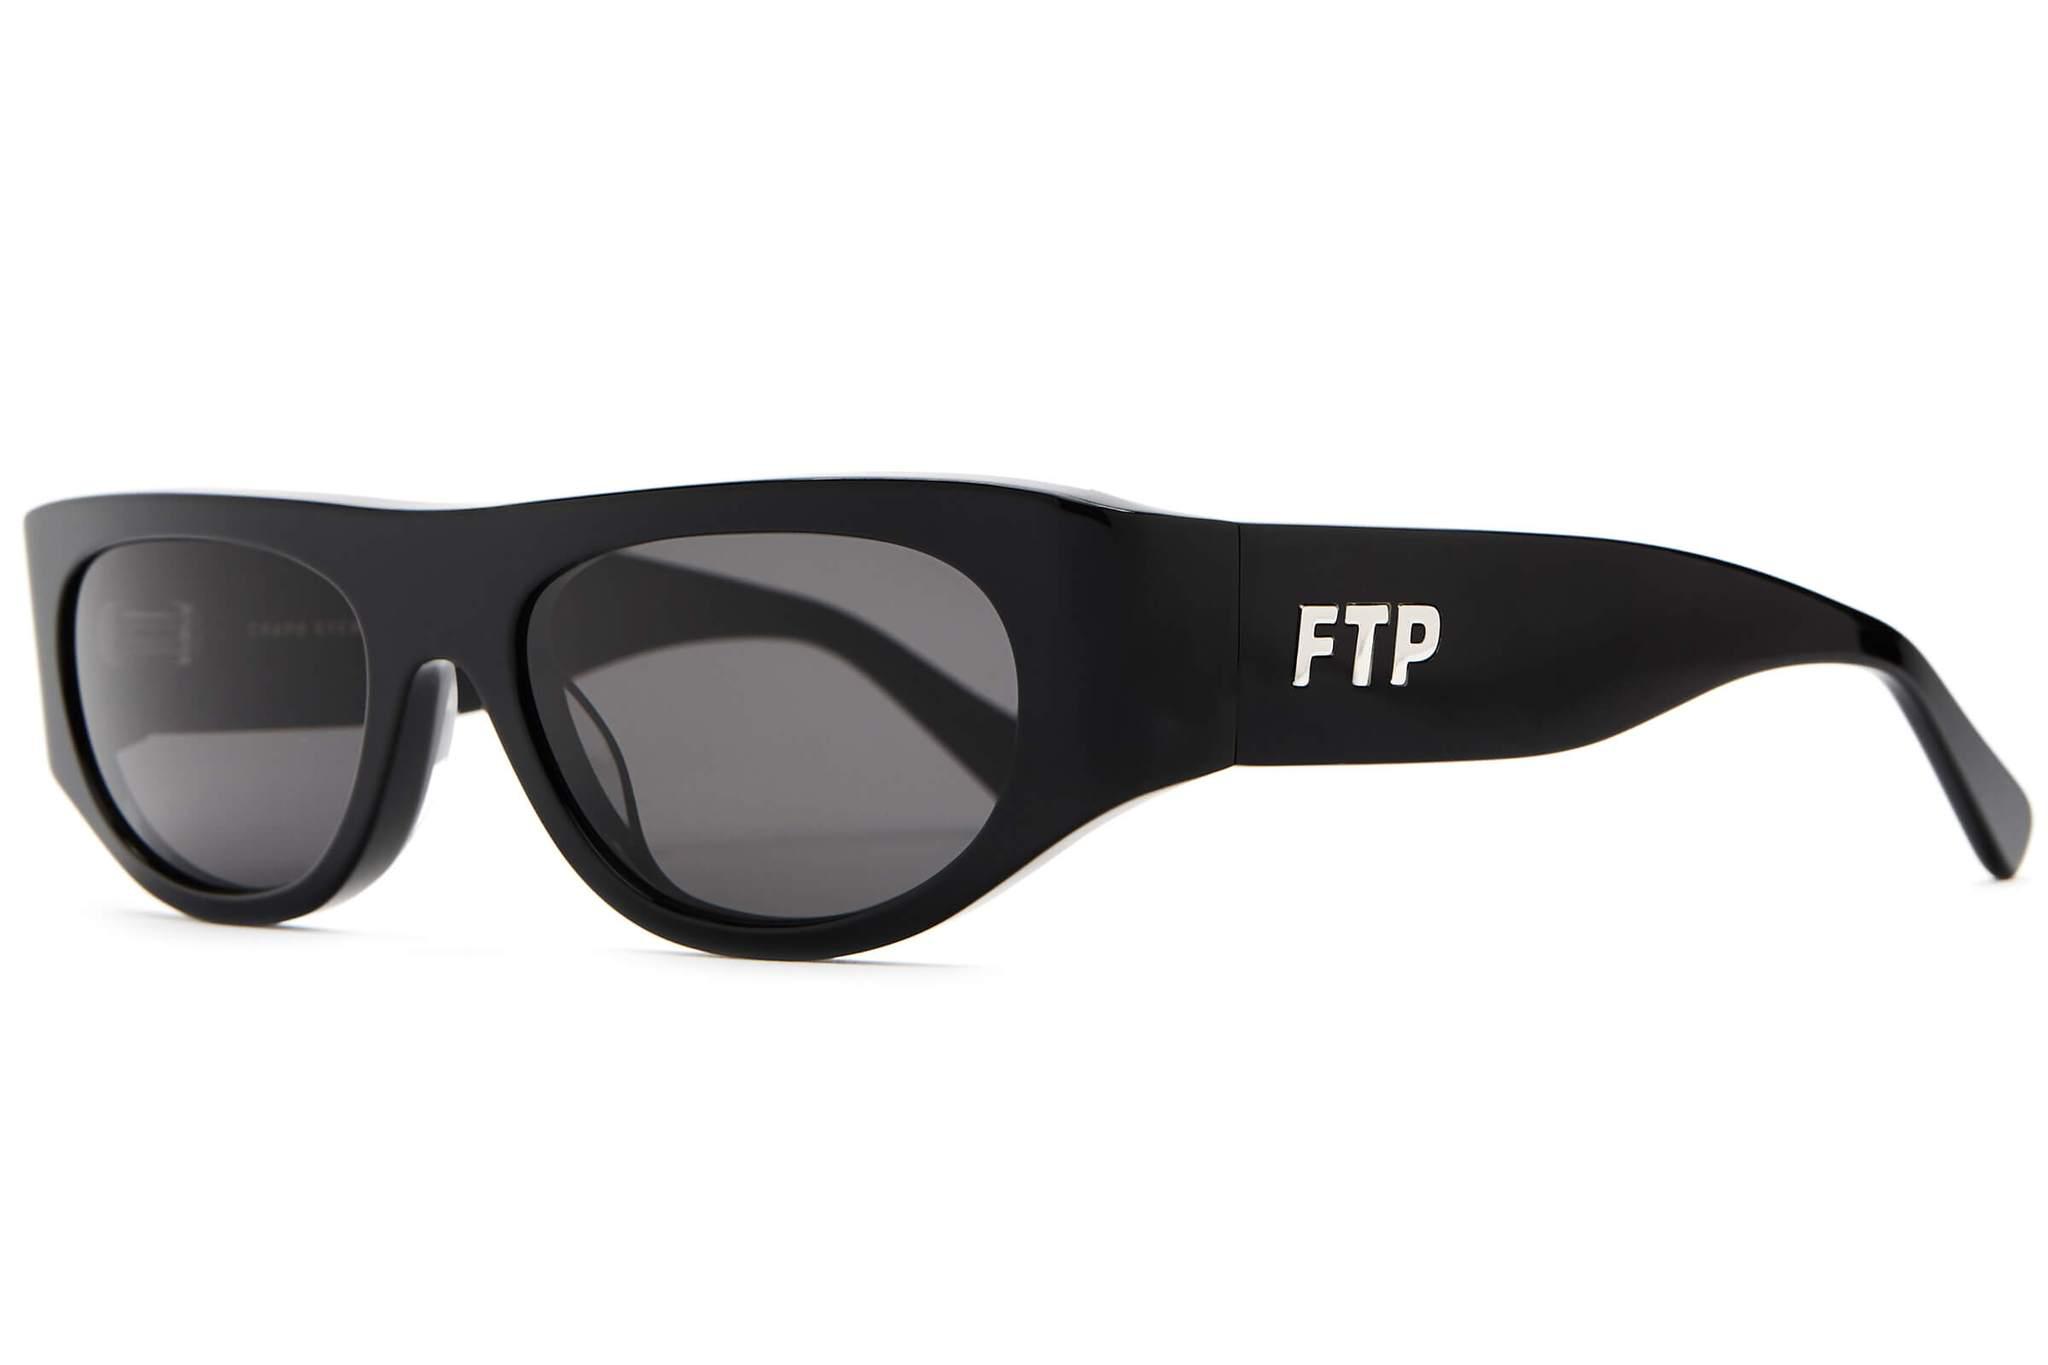 Ftp X Crap Eyewear Loc Sunglasses Black/Grey by Stock X